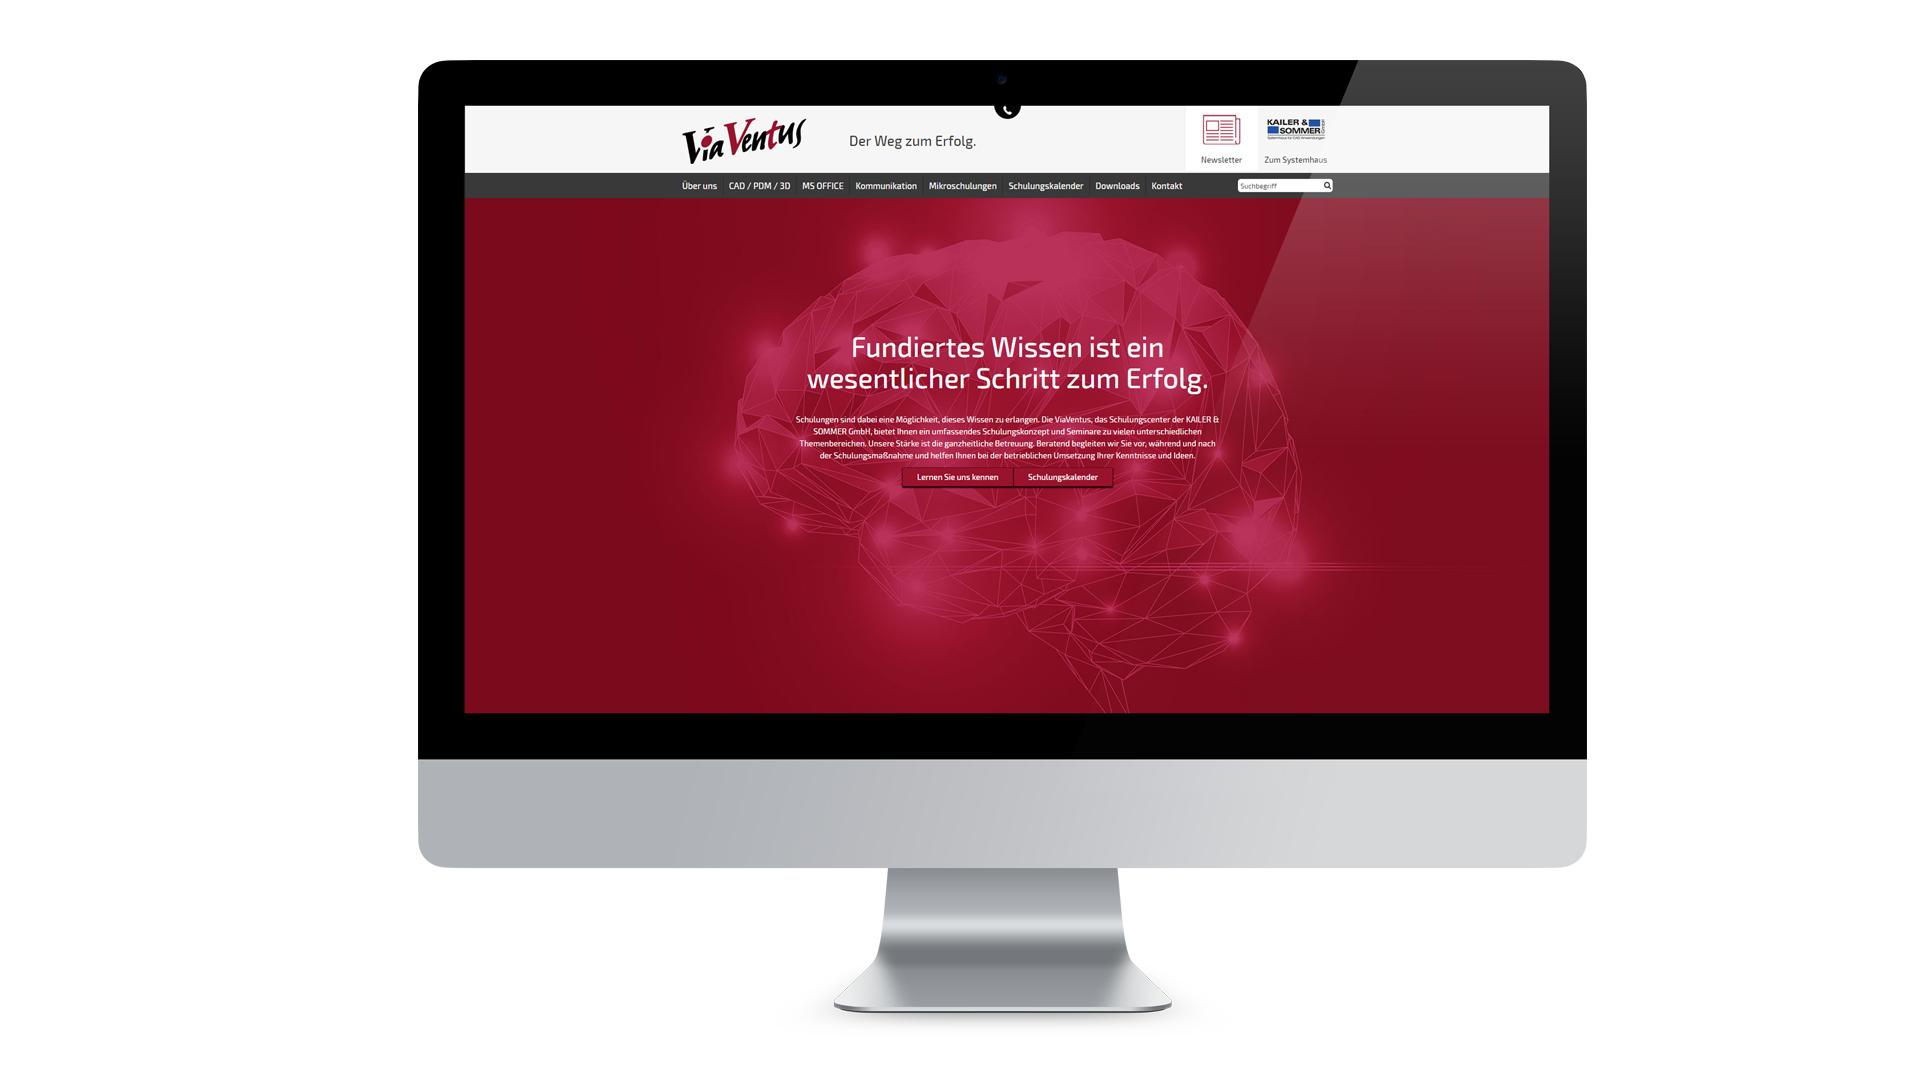 ViaVentus Schulungscenter Web